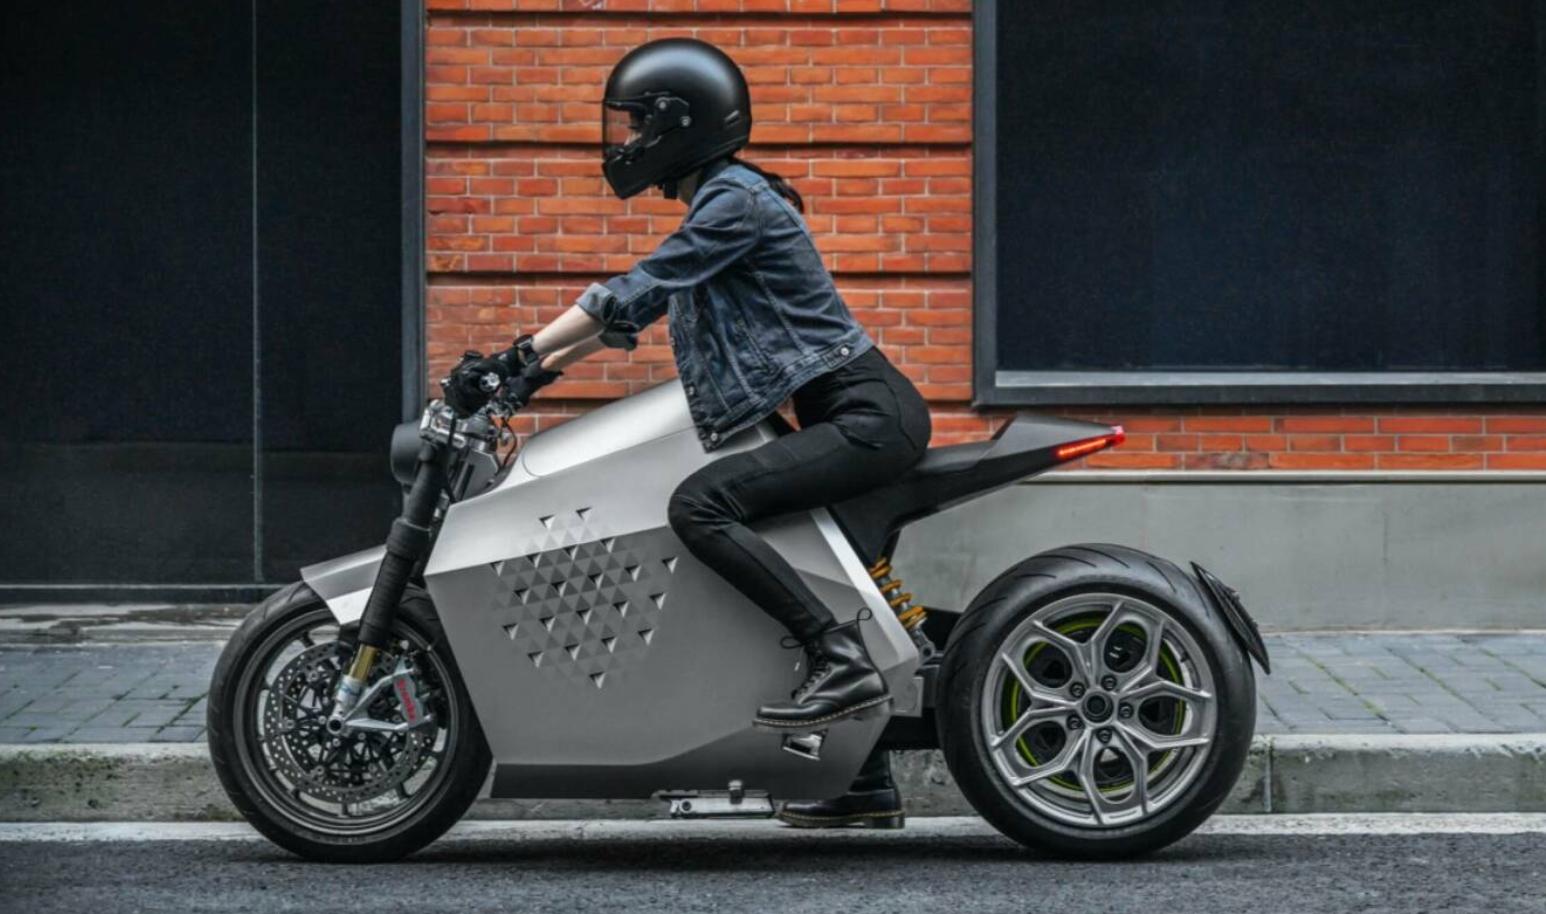 novedades motos eléctricas 2021 1